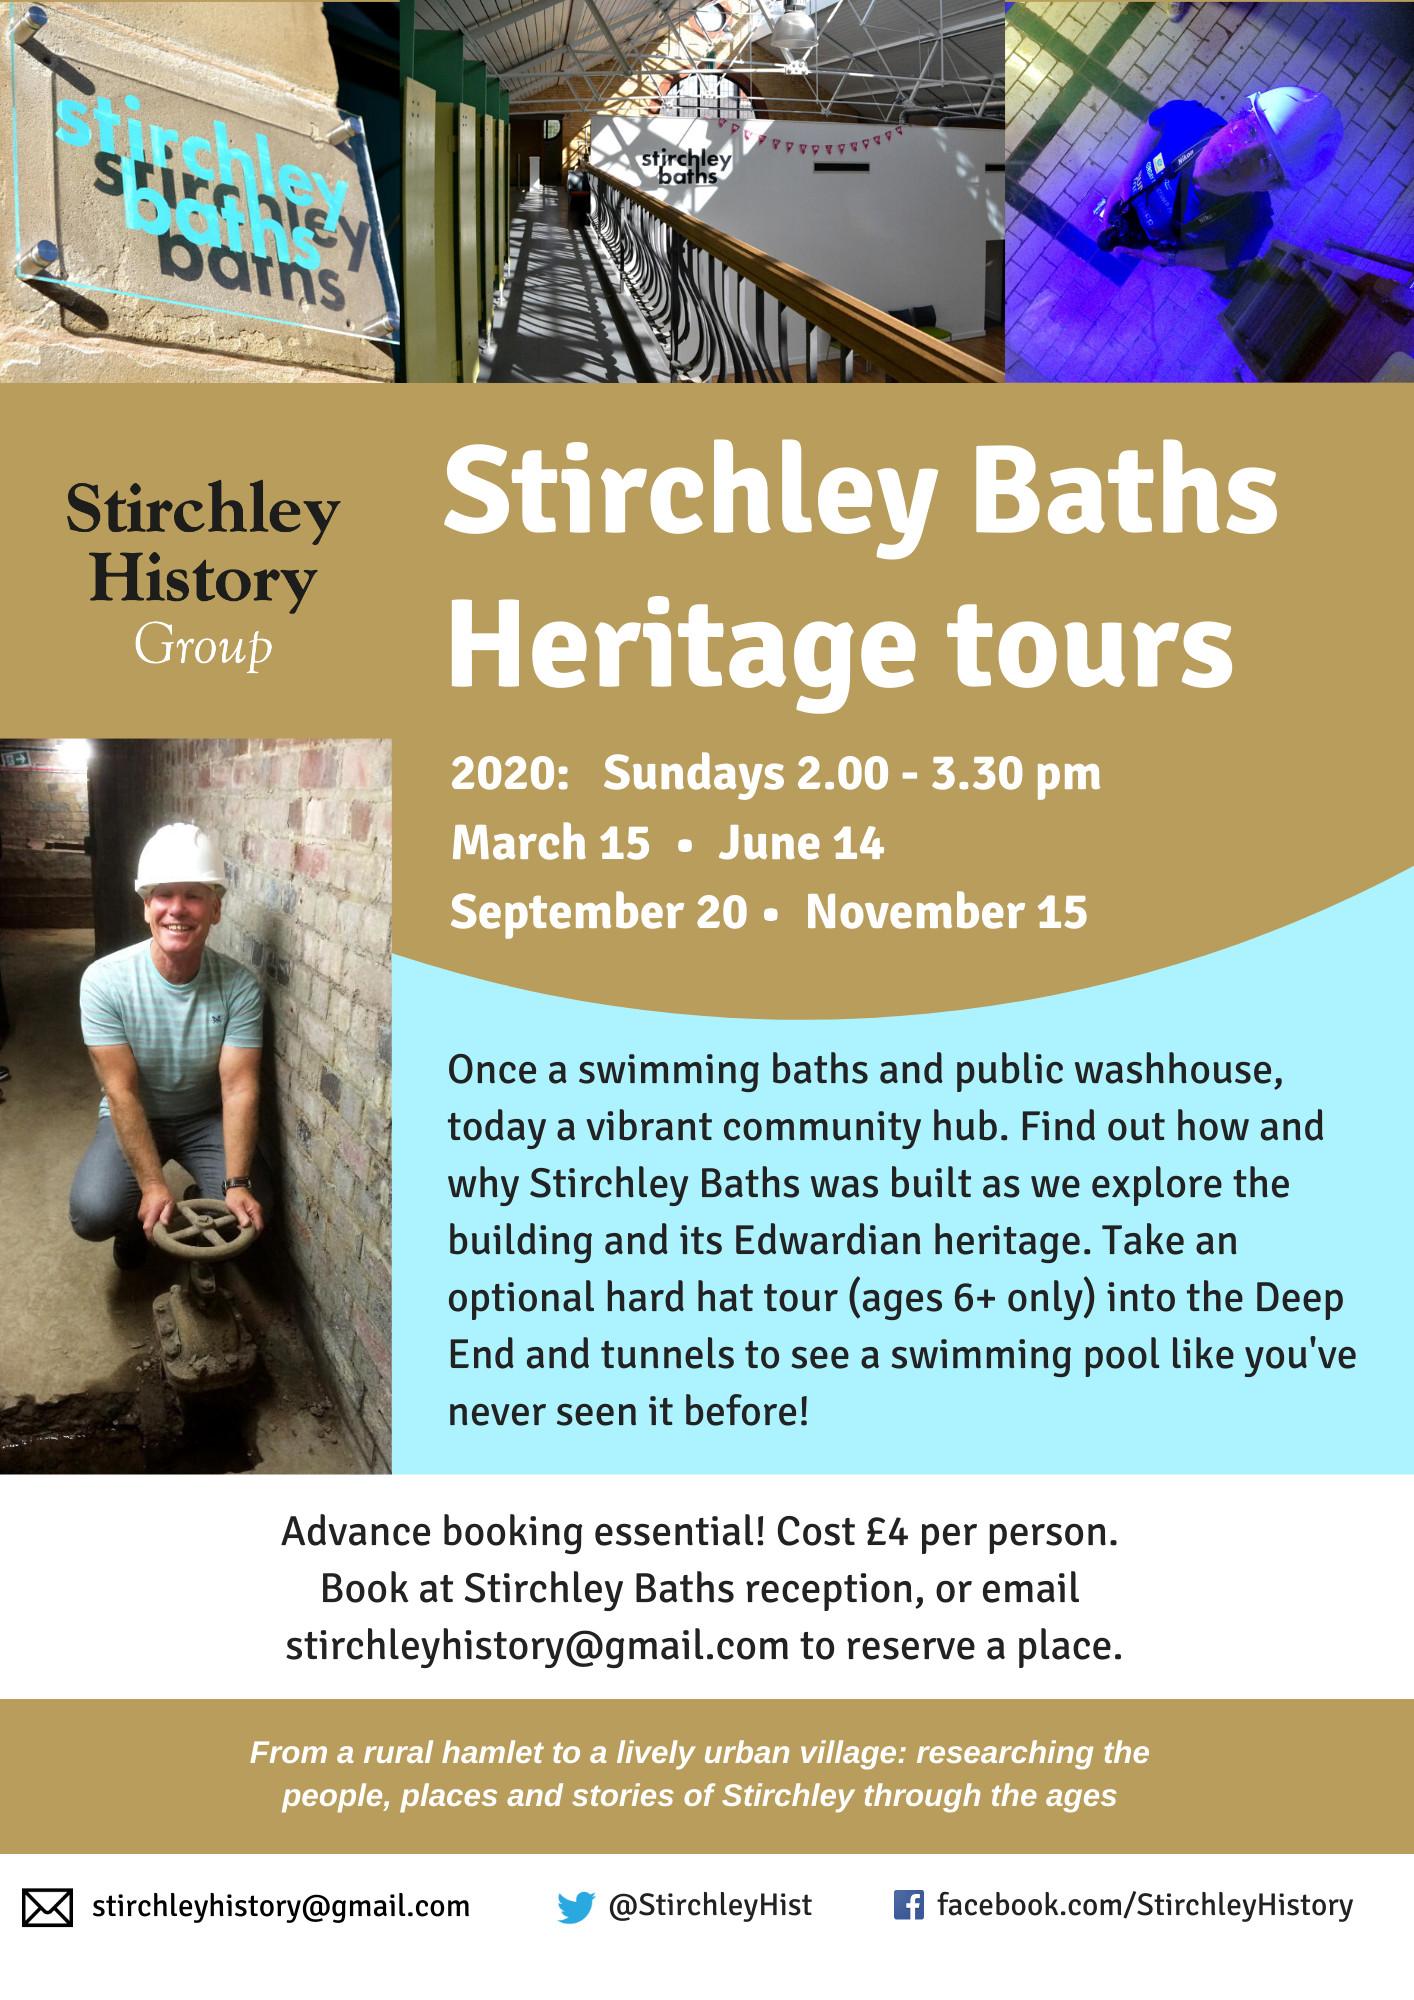 Details of Stirchley Baths heritage tours 2020: March 15, June 14, September 20, November 15